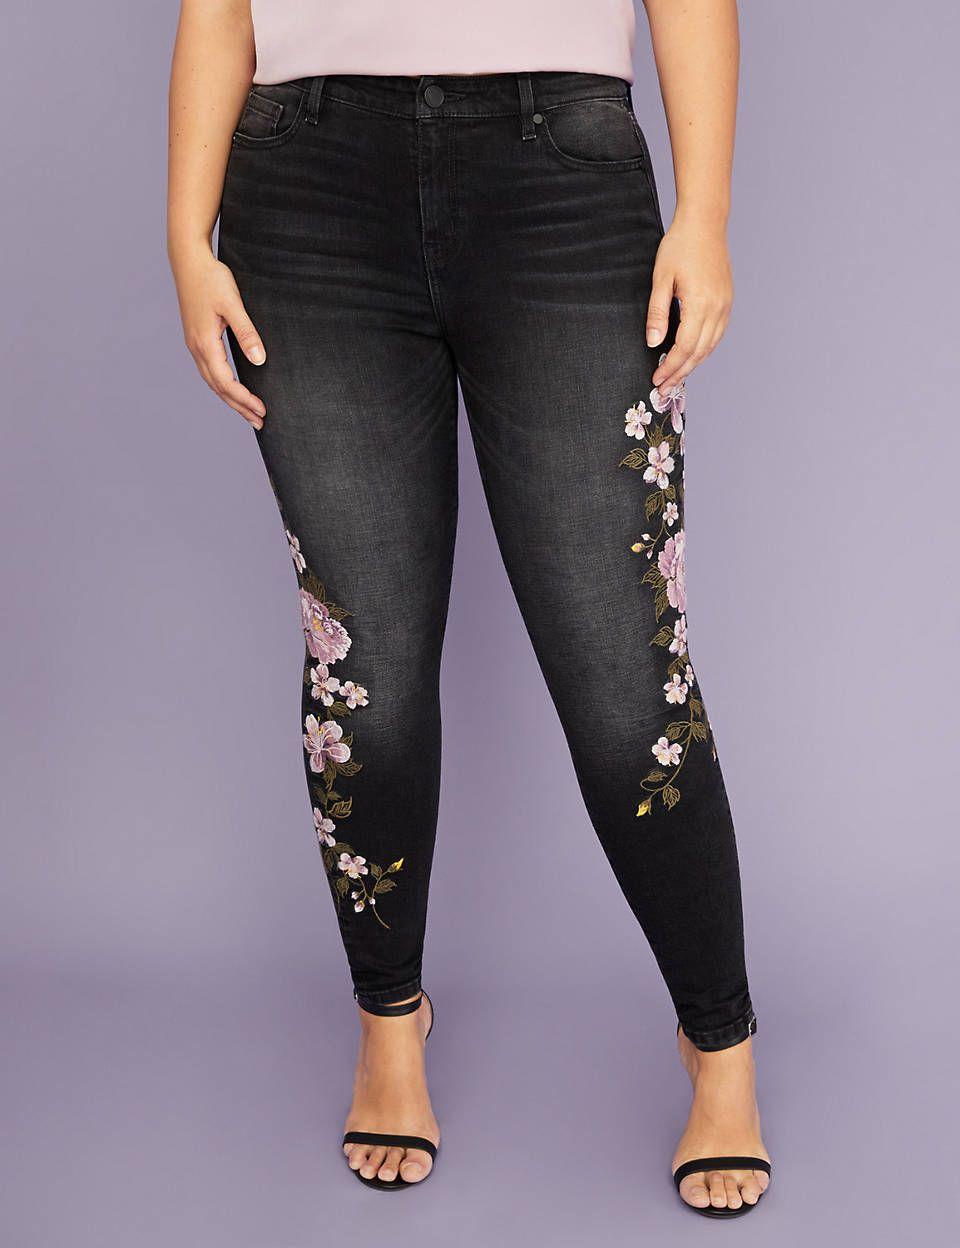 30d64deffda Super Stretch Skinny Jean - Purple Floral Embroidery